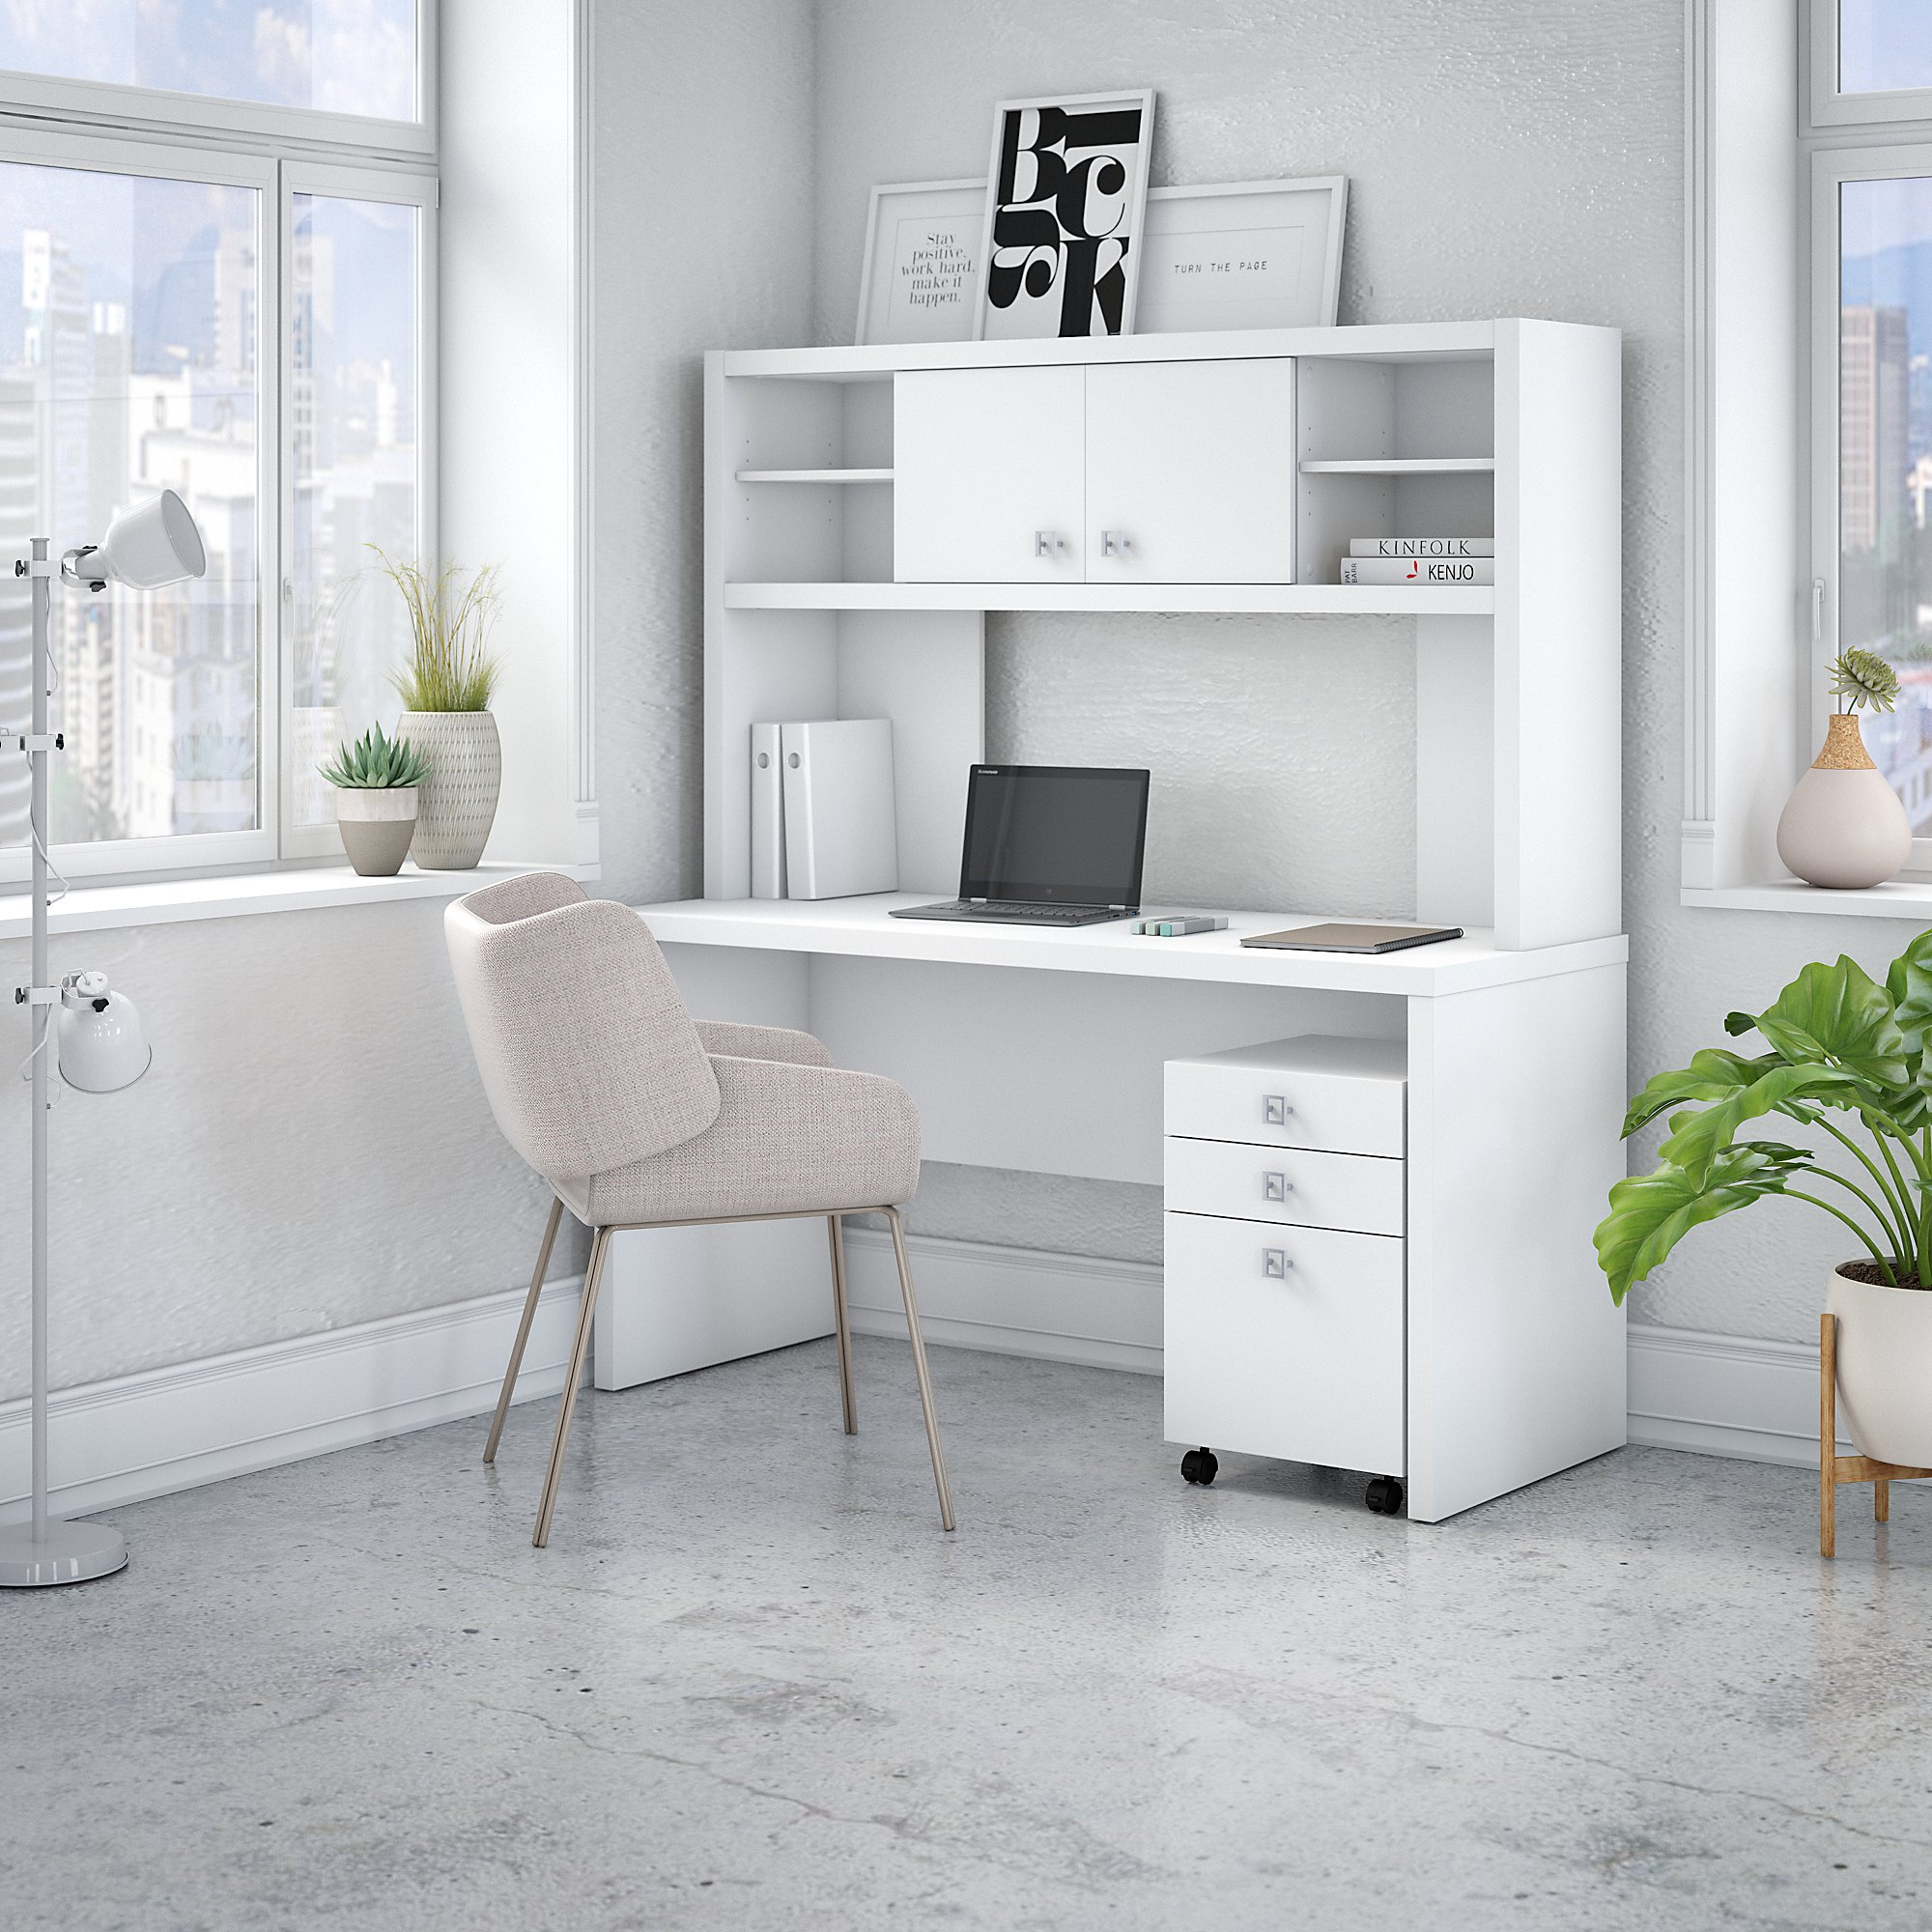 ech006 office by kathy ireland echo pure white credenza desk